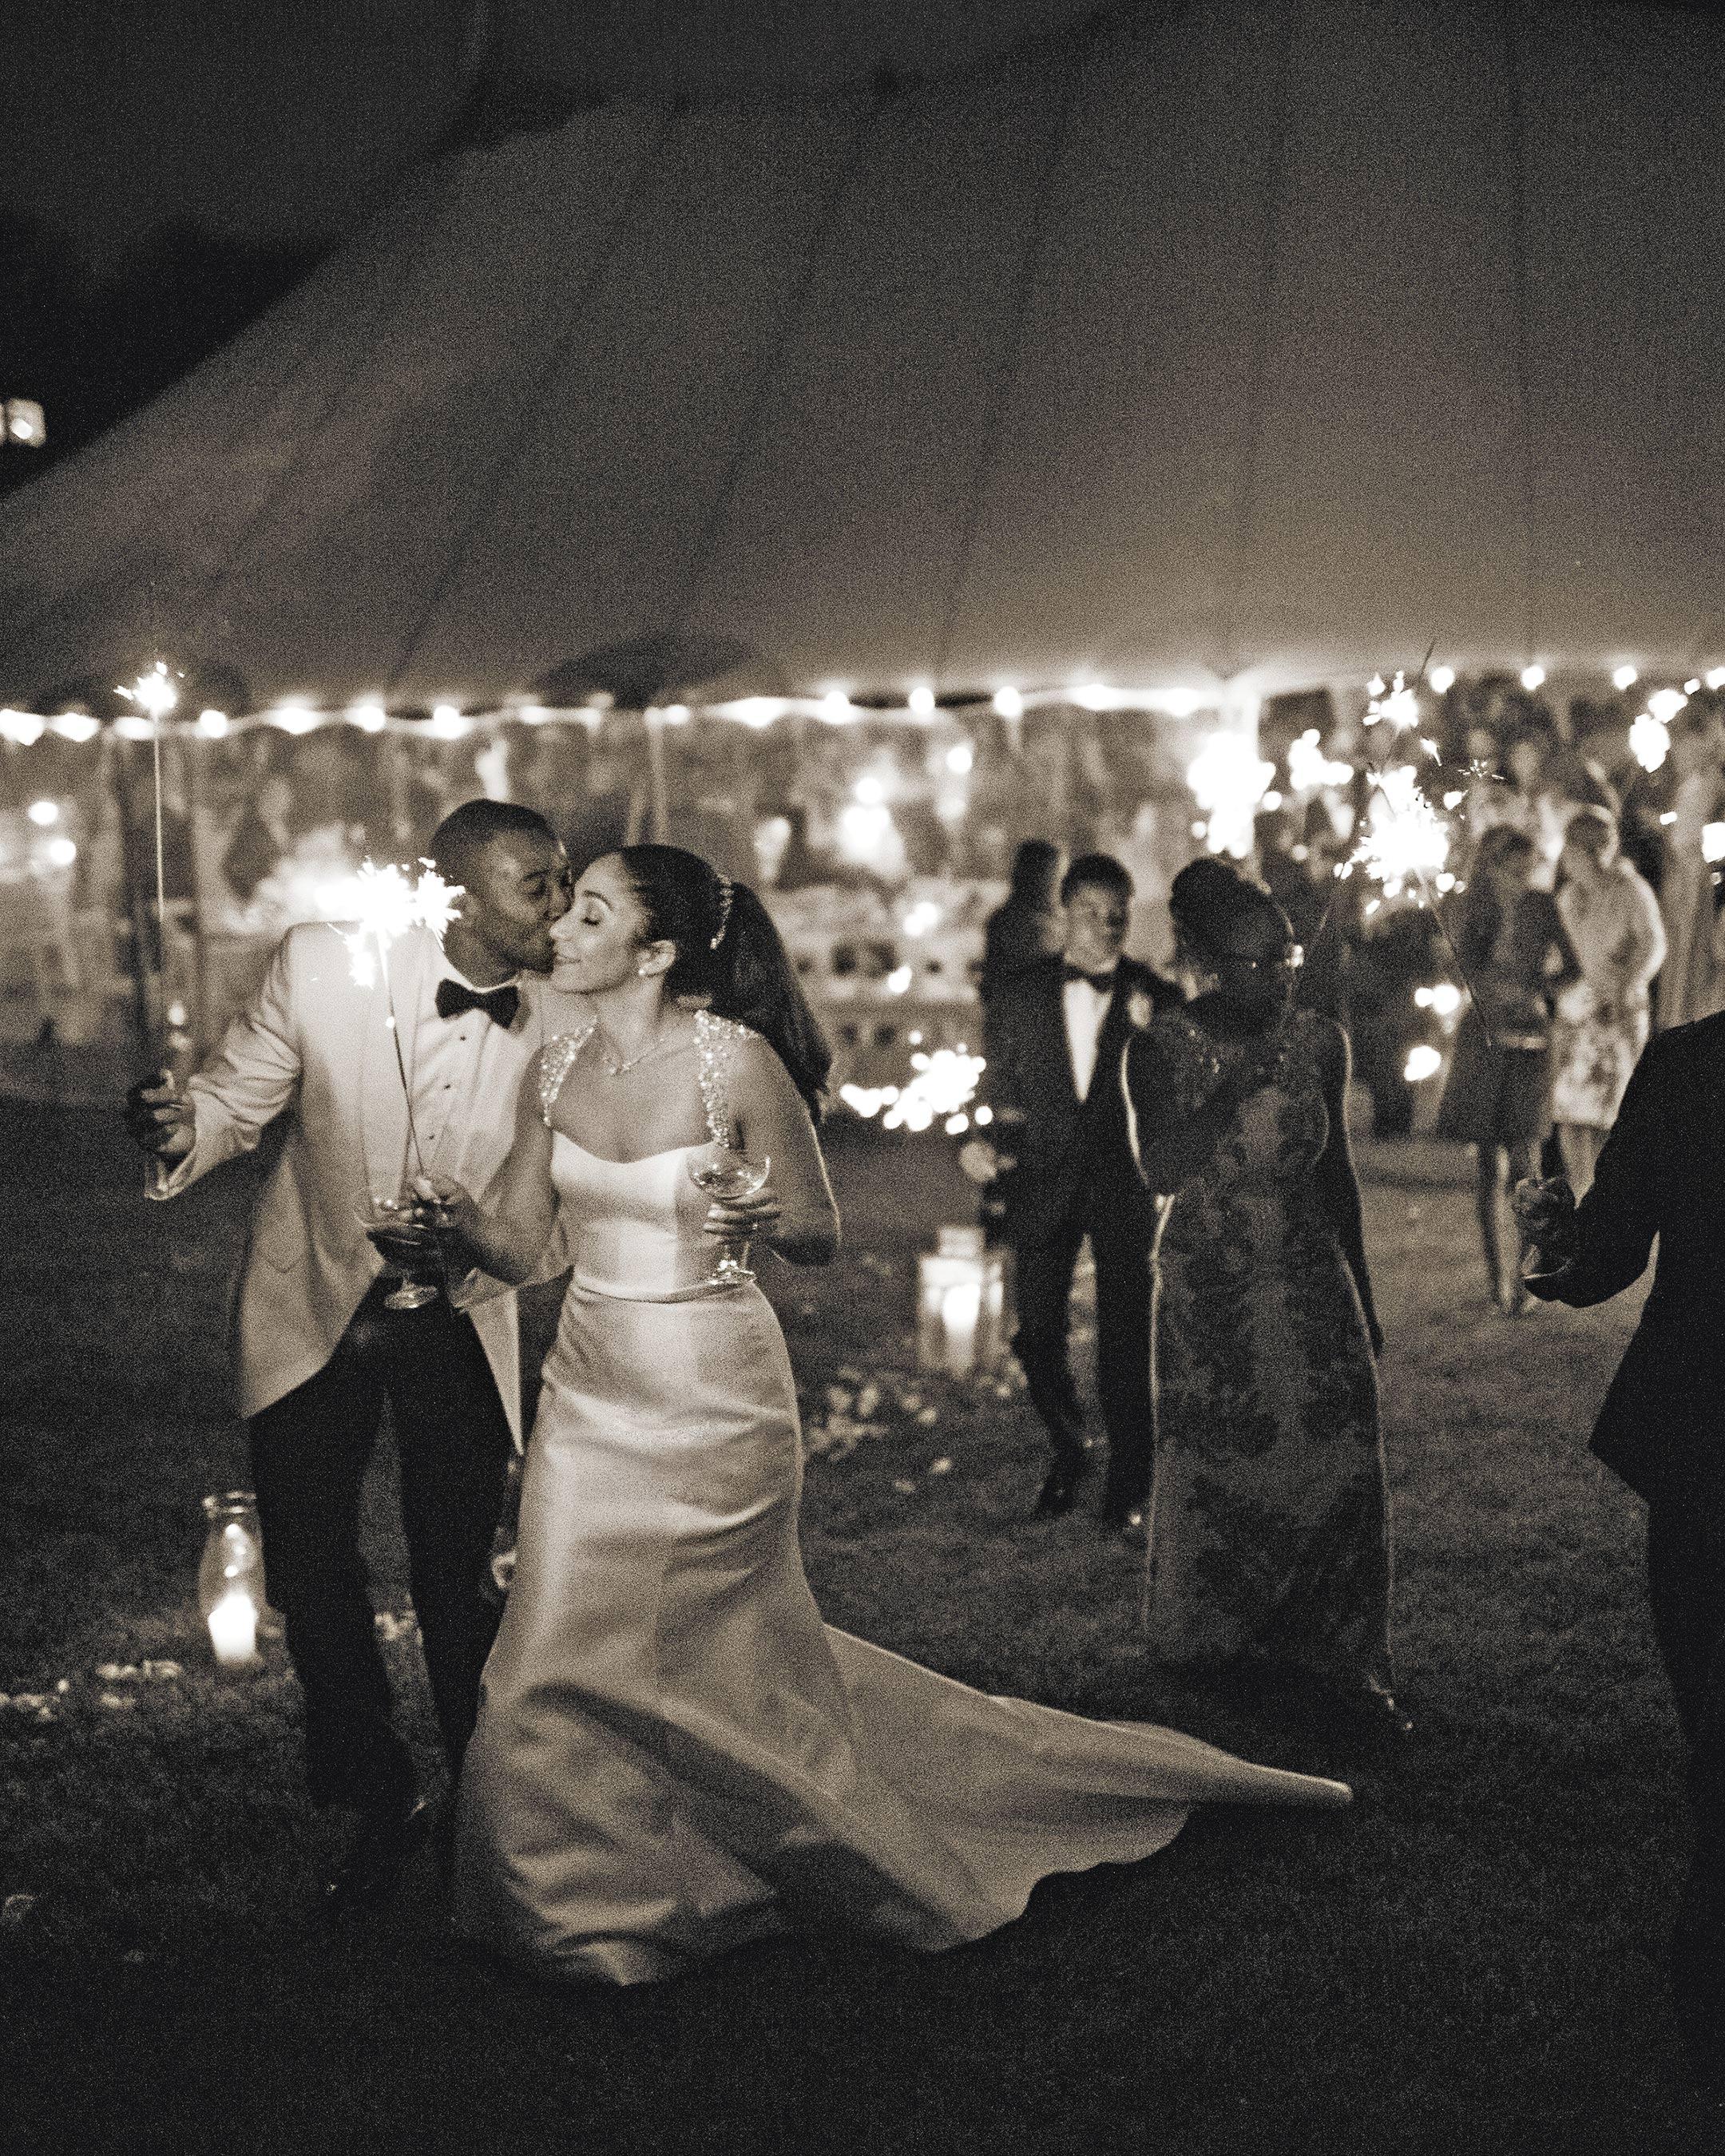 mhonor-jay-wedding-connecticut-sparkler-sendoff-1334-d112238-bw.jpg